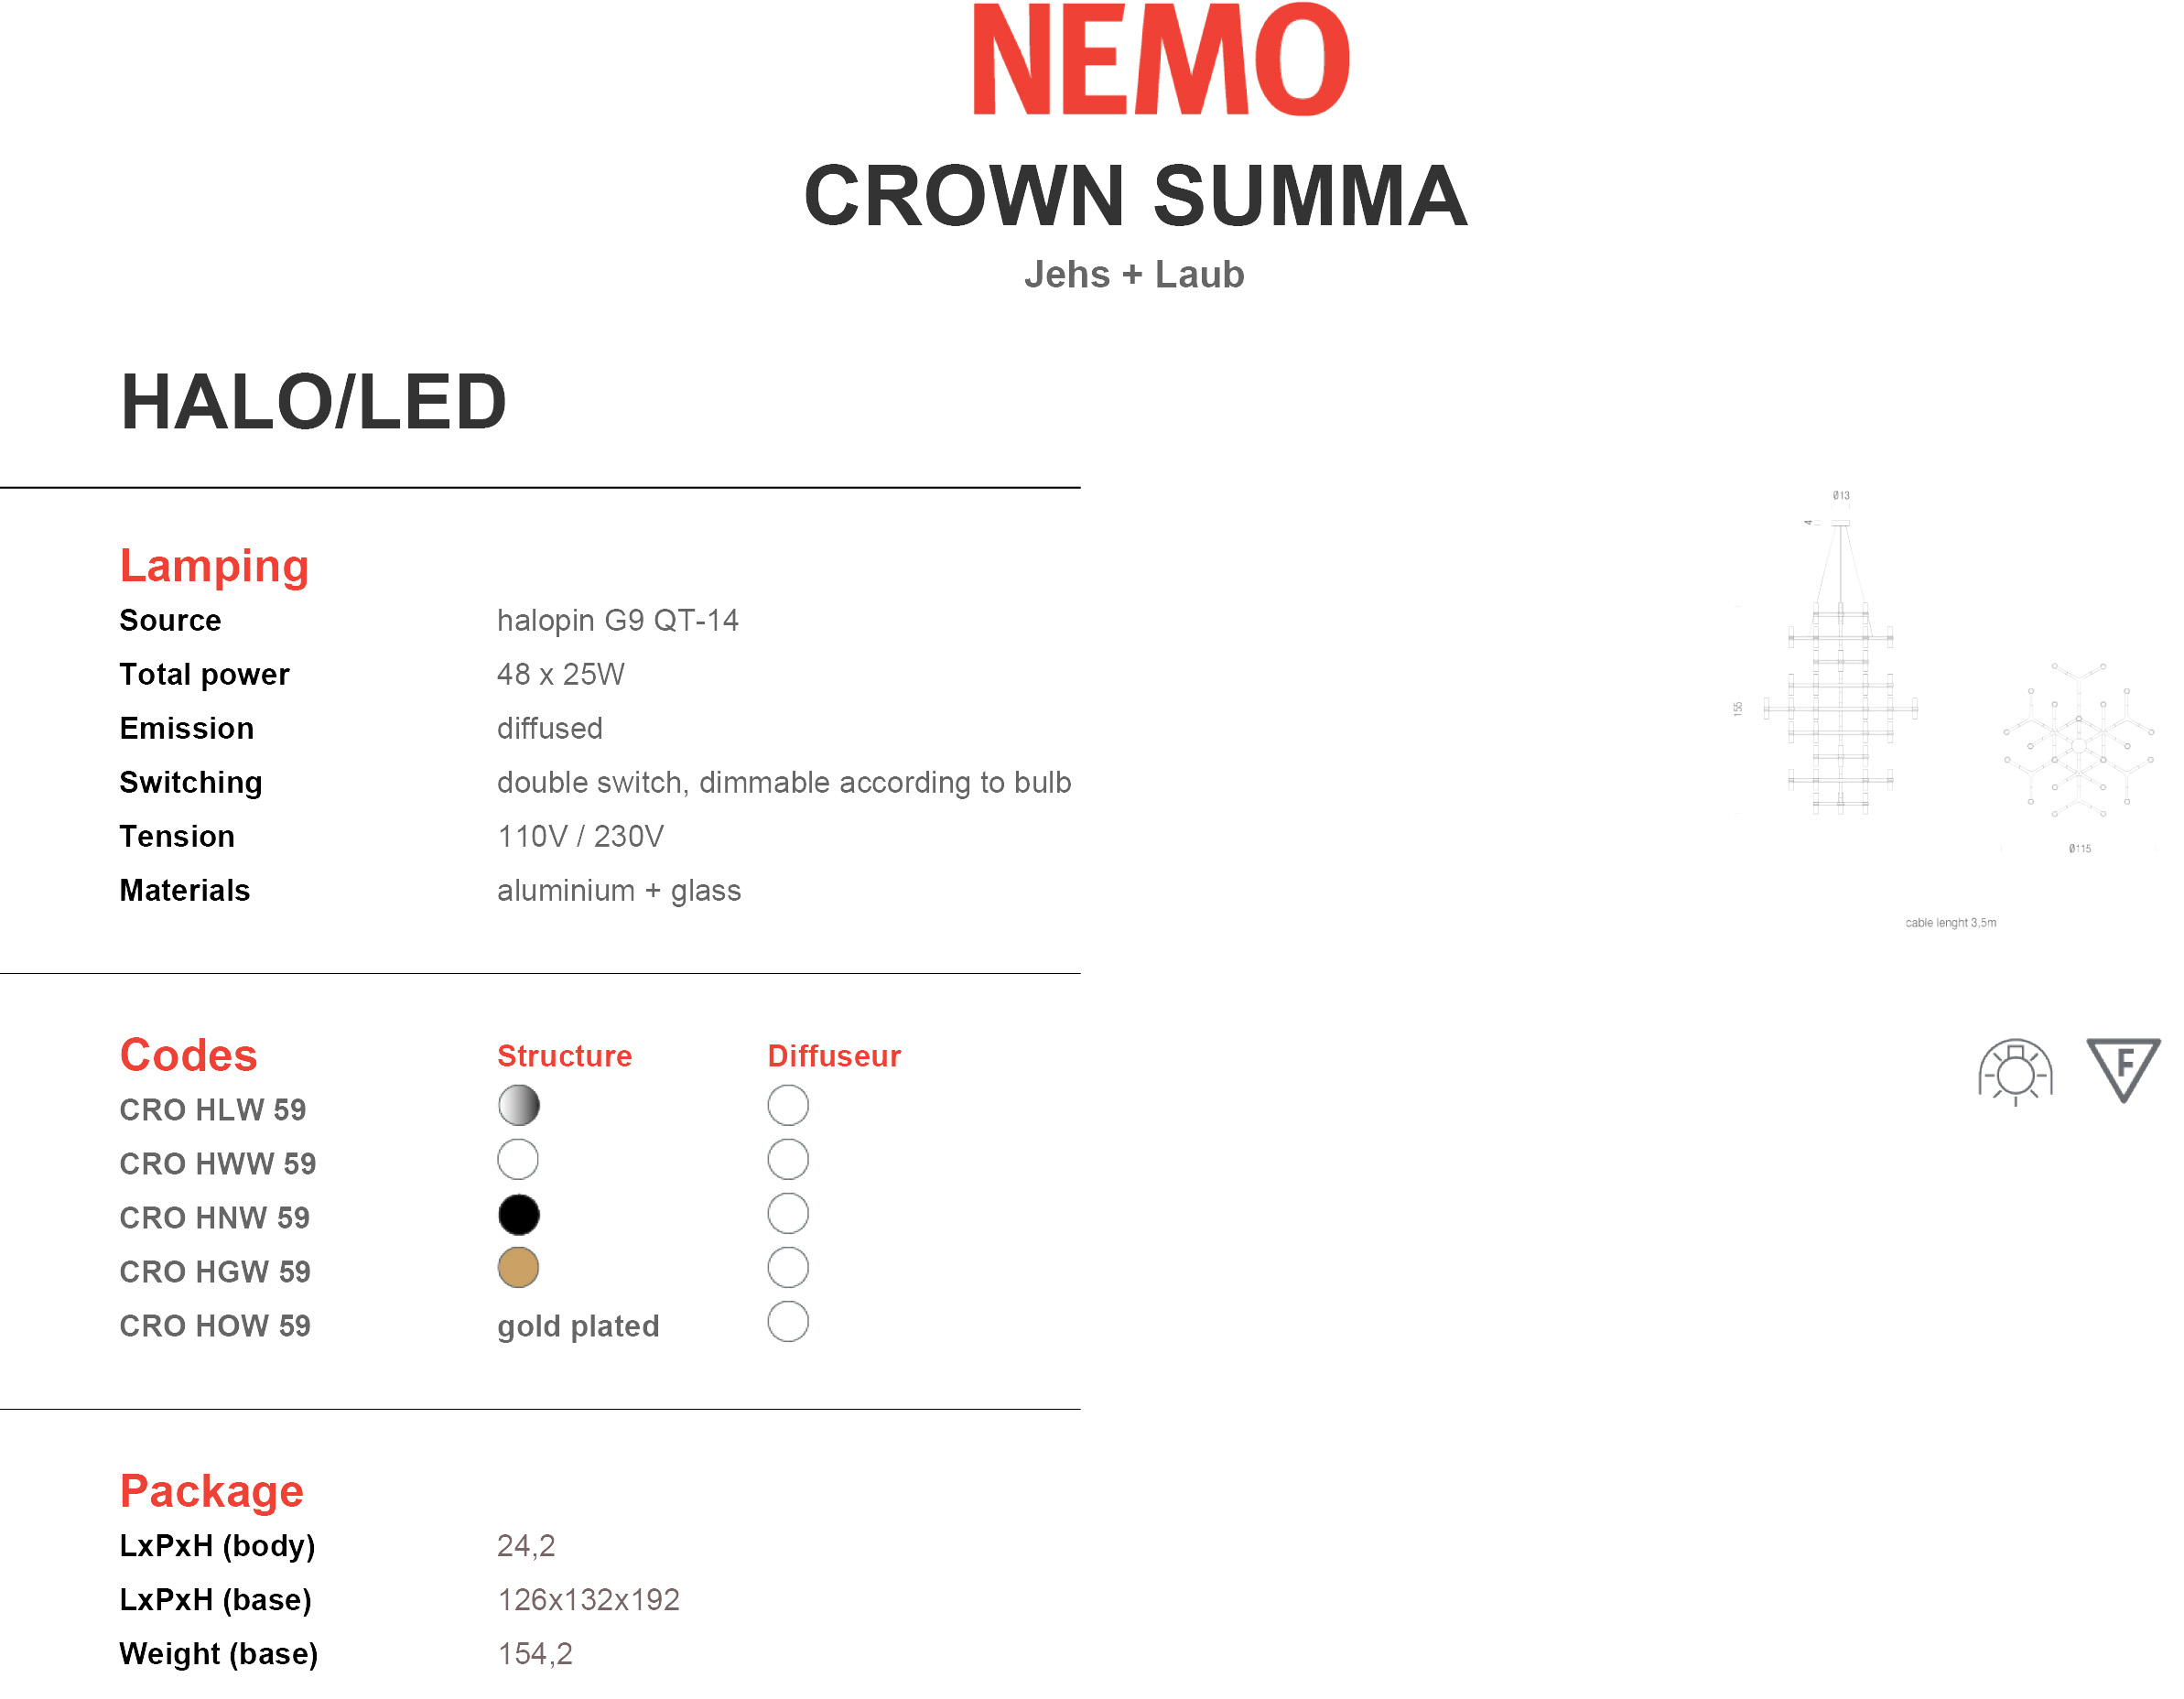 Nemo Crown Summa Tech